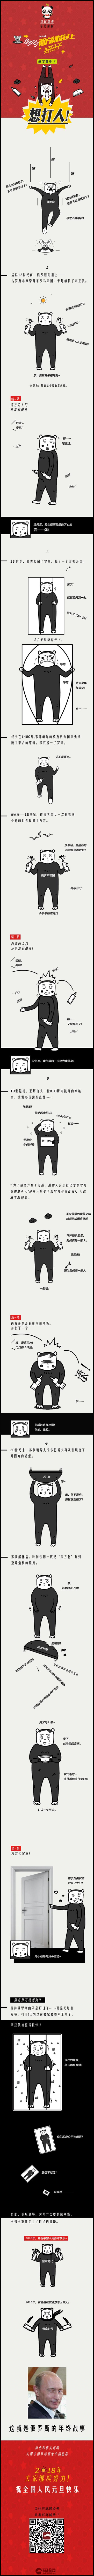 pc蛋蛋官方网站